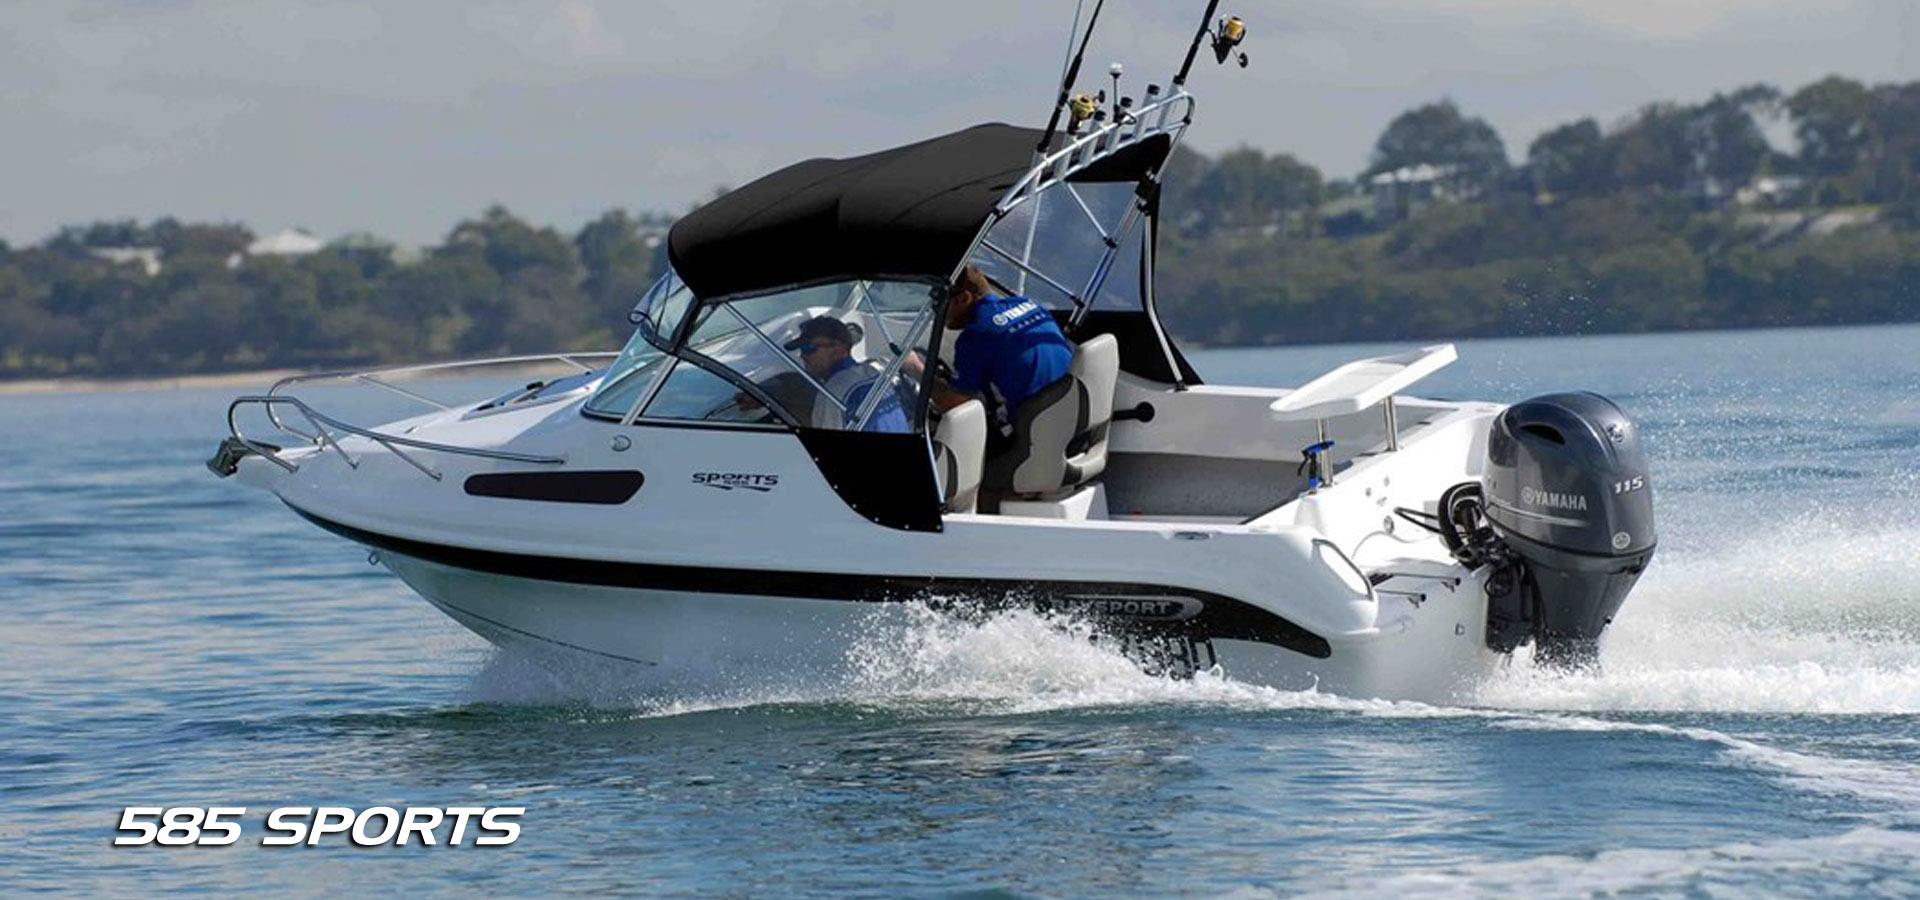 Baysport Boats 585 Sports fibreglass boats